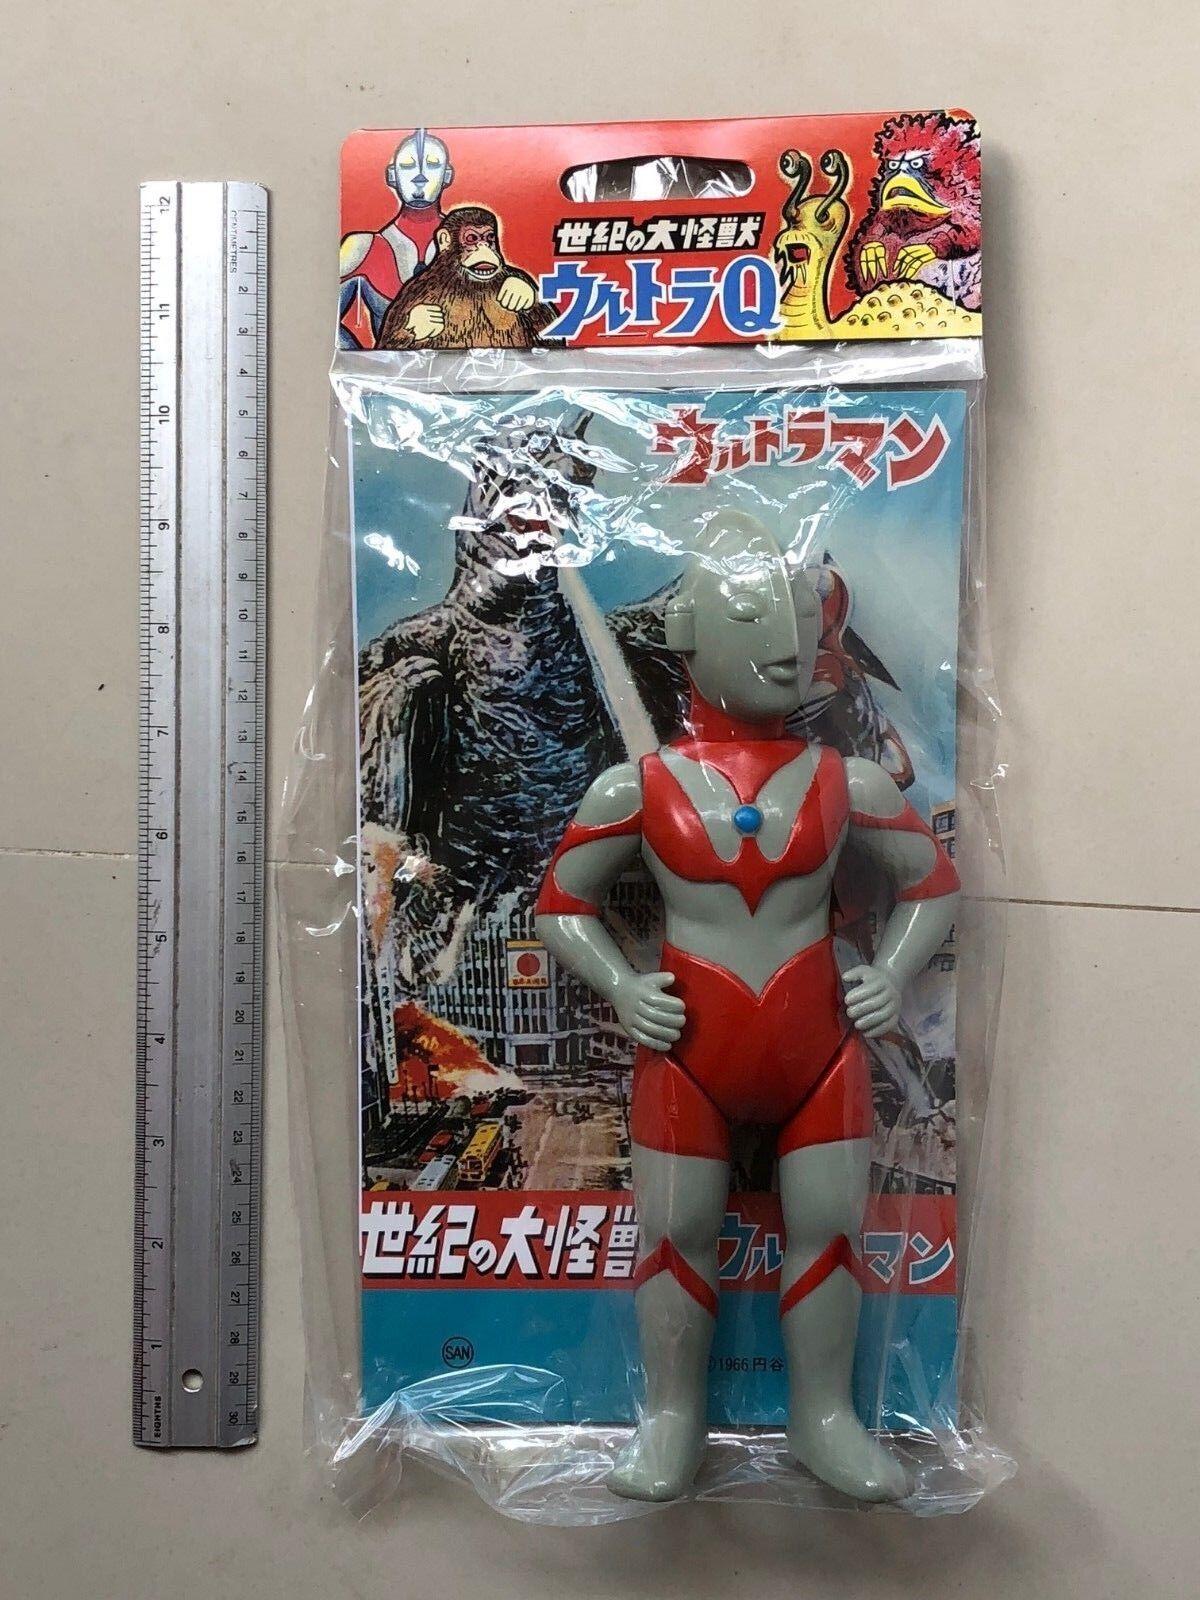 Marusan Ultraman 350 années 1960 IMAGE 1st Ver. M1 Figure Sofubi Soft Vinyl Toy Sofvi